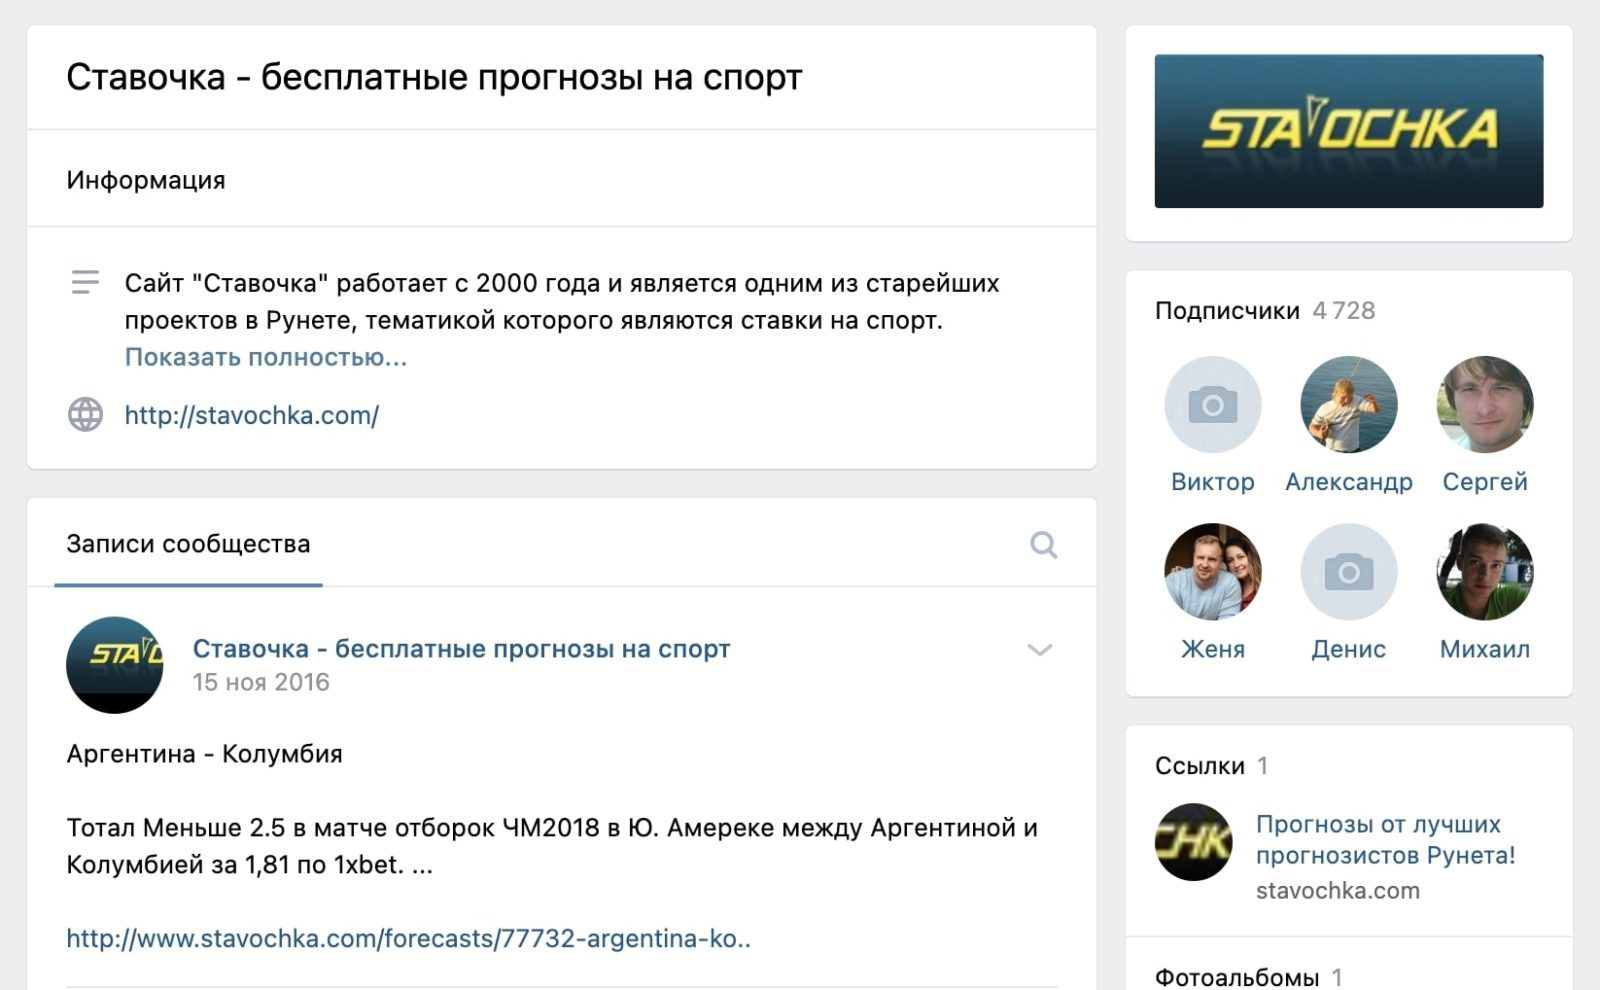 Группа ВК Stavochka.com (Ставочка)